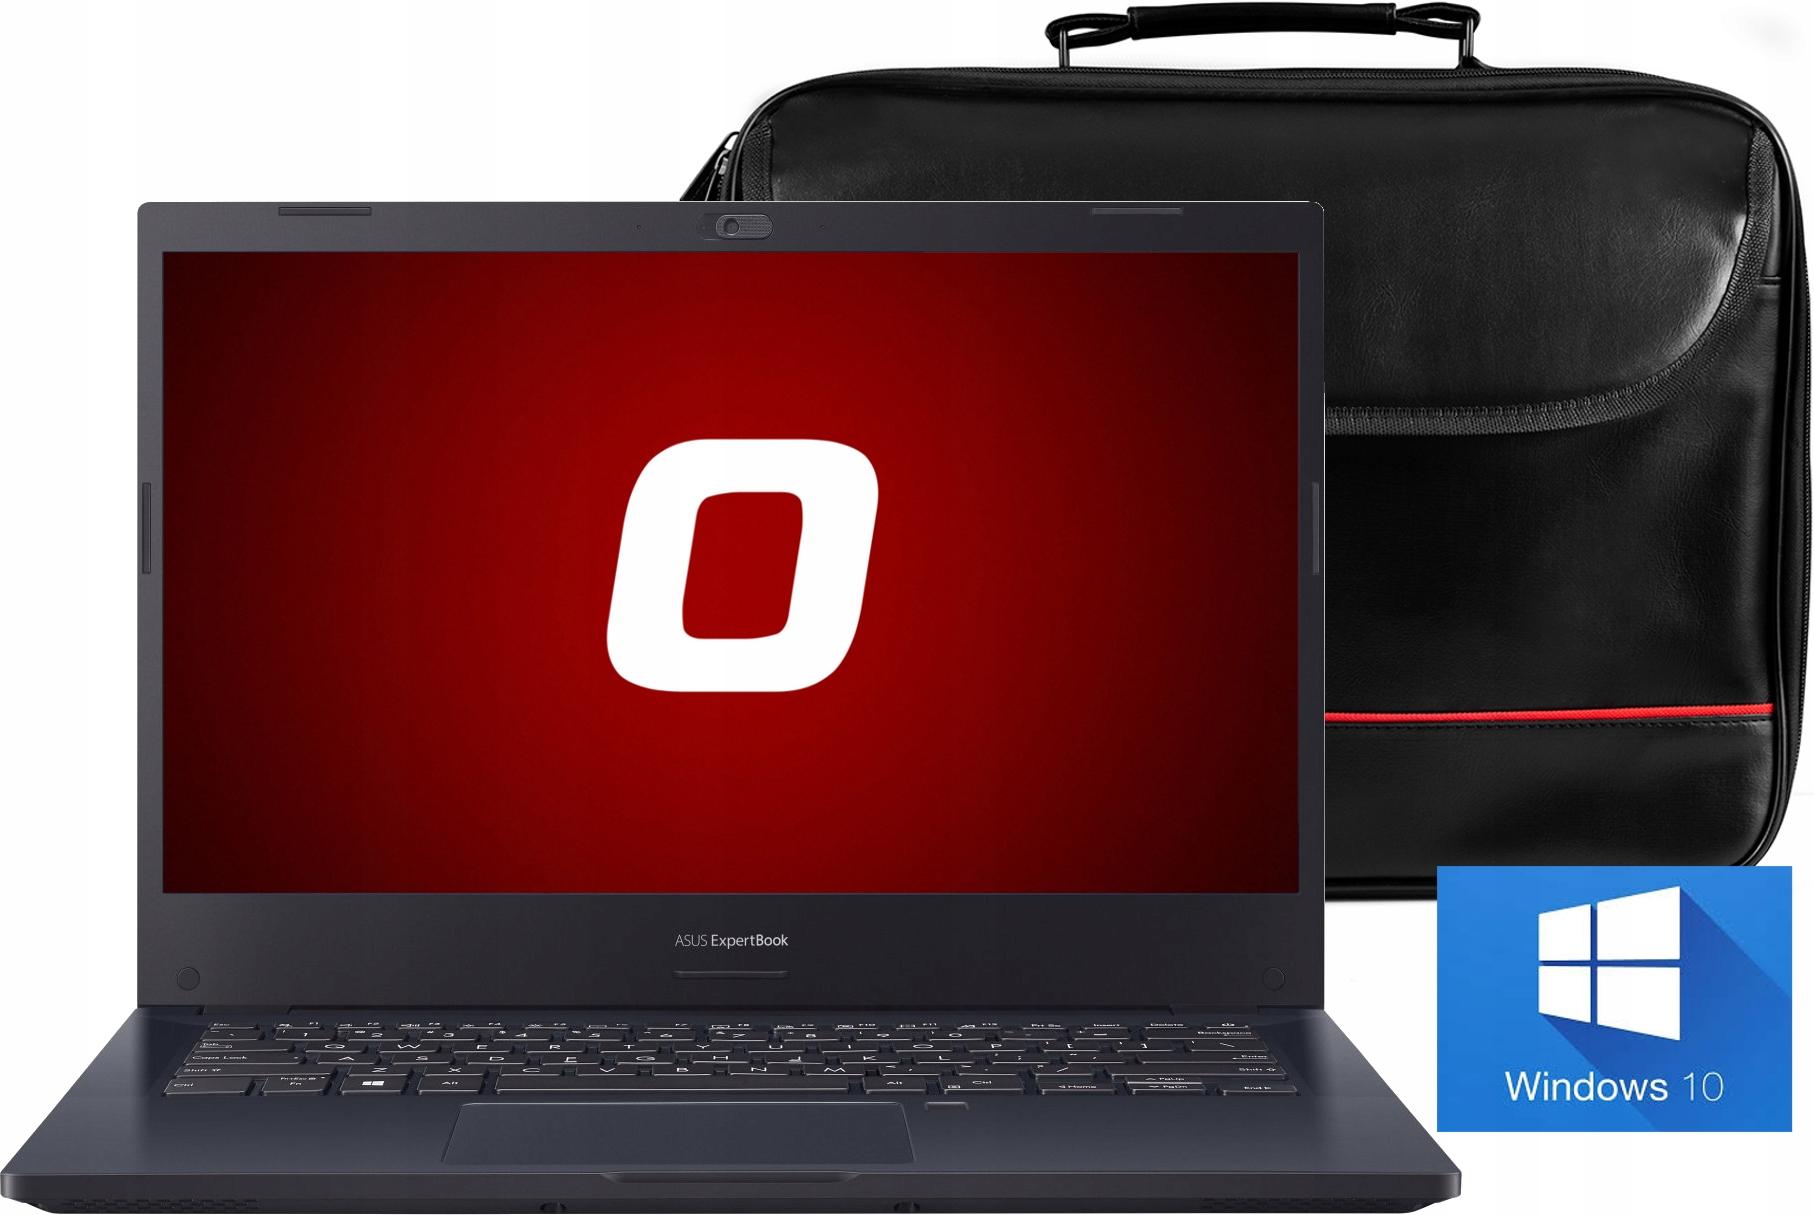 LAPTOP ASUS BIZNESOWY CORE i3 8GB SSD256 Win10